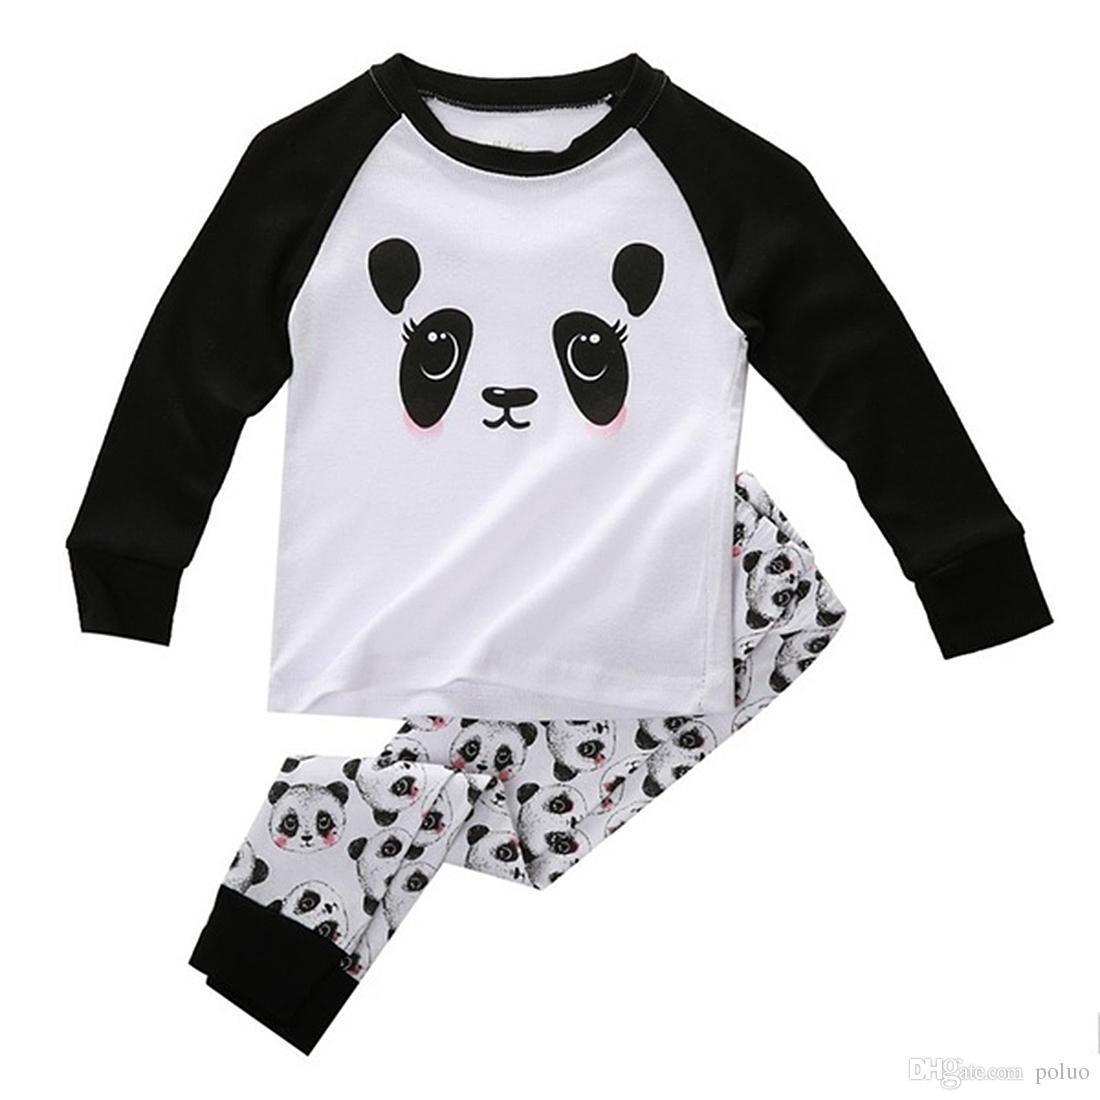 def35a04e443 Cute Panda Baby Toddler Kids Boys Girls Sleepwear Nightwear Pajama Set  Girls Shorts Pyjamas Footie Pajamas Kids From Poluo